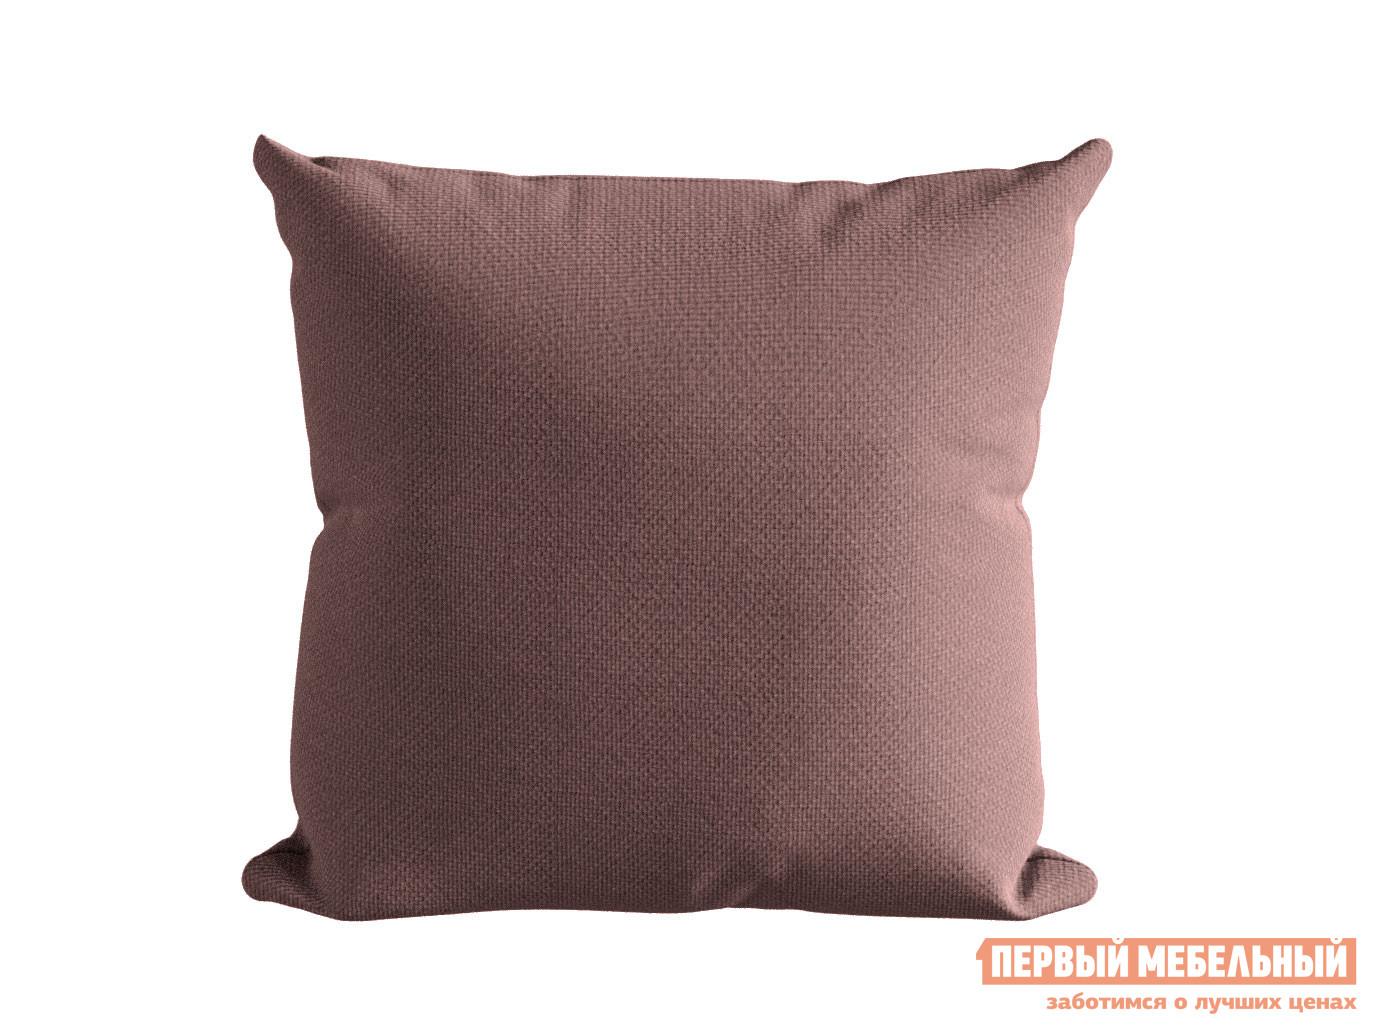 Декоративная подушка  ШН(391-15), Размер 45х45 брусника Брусника, рогожка Ми Текстиль 116213